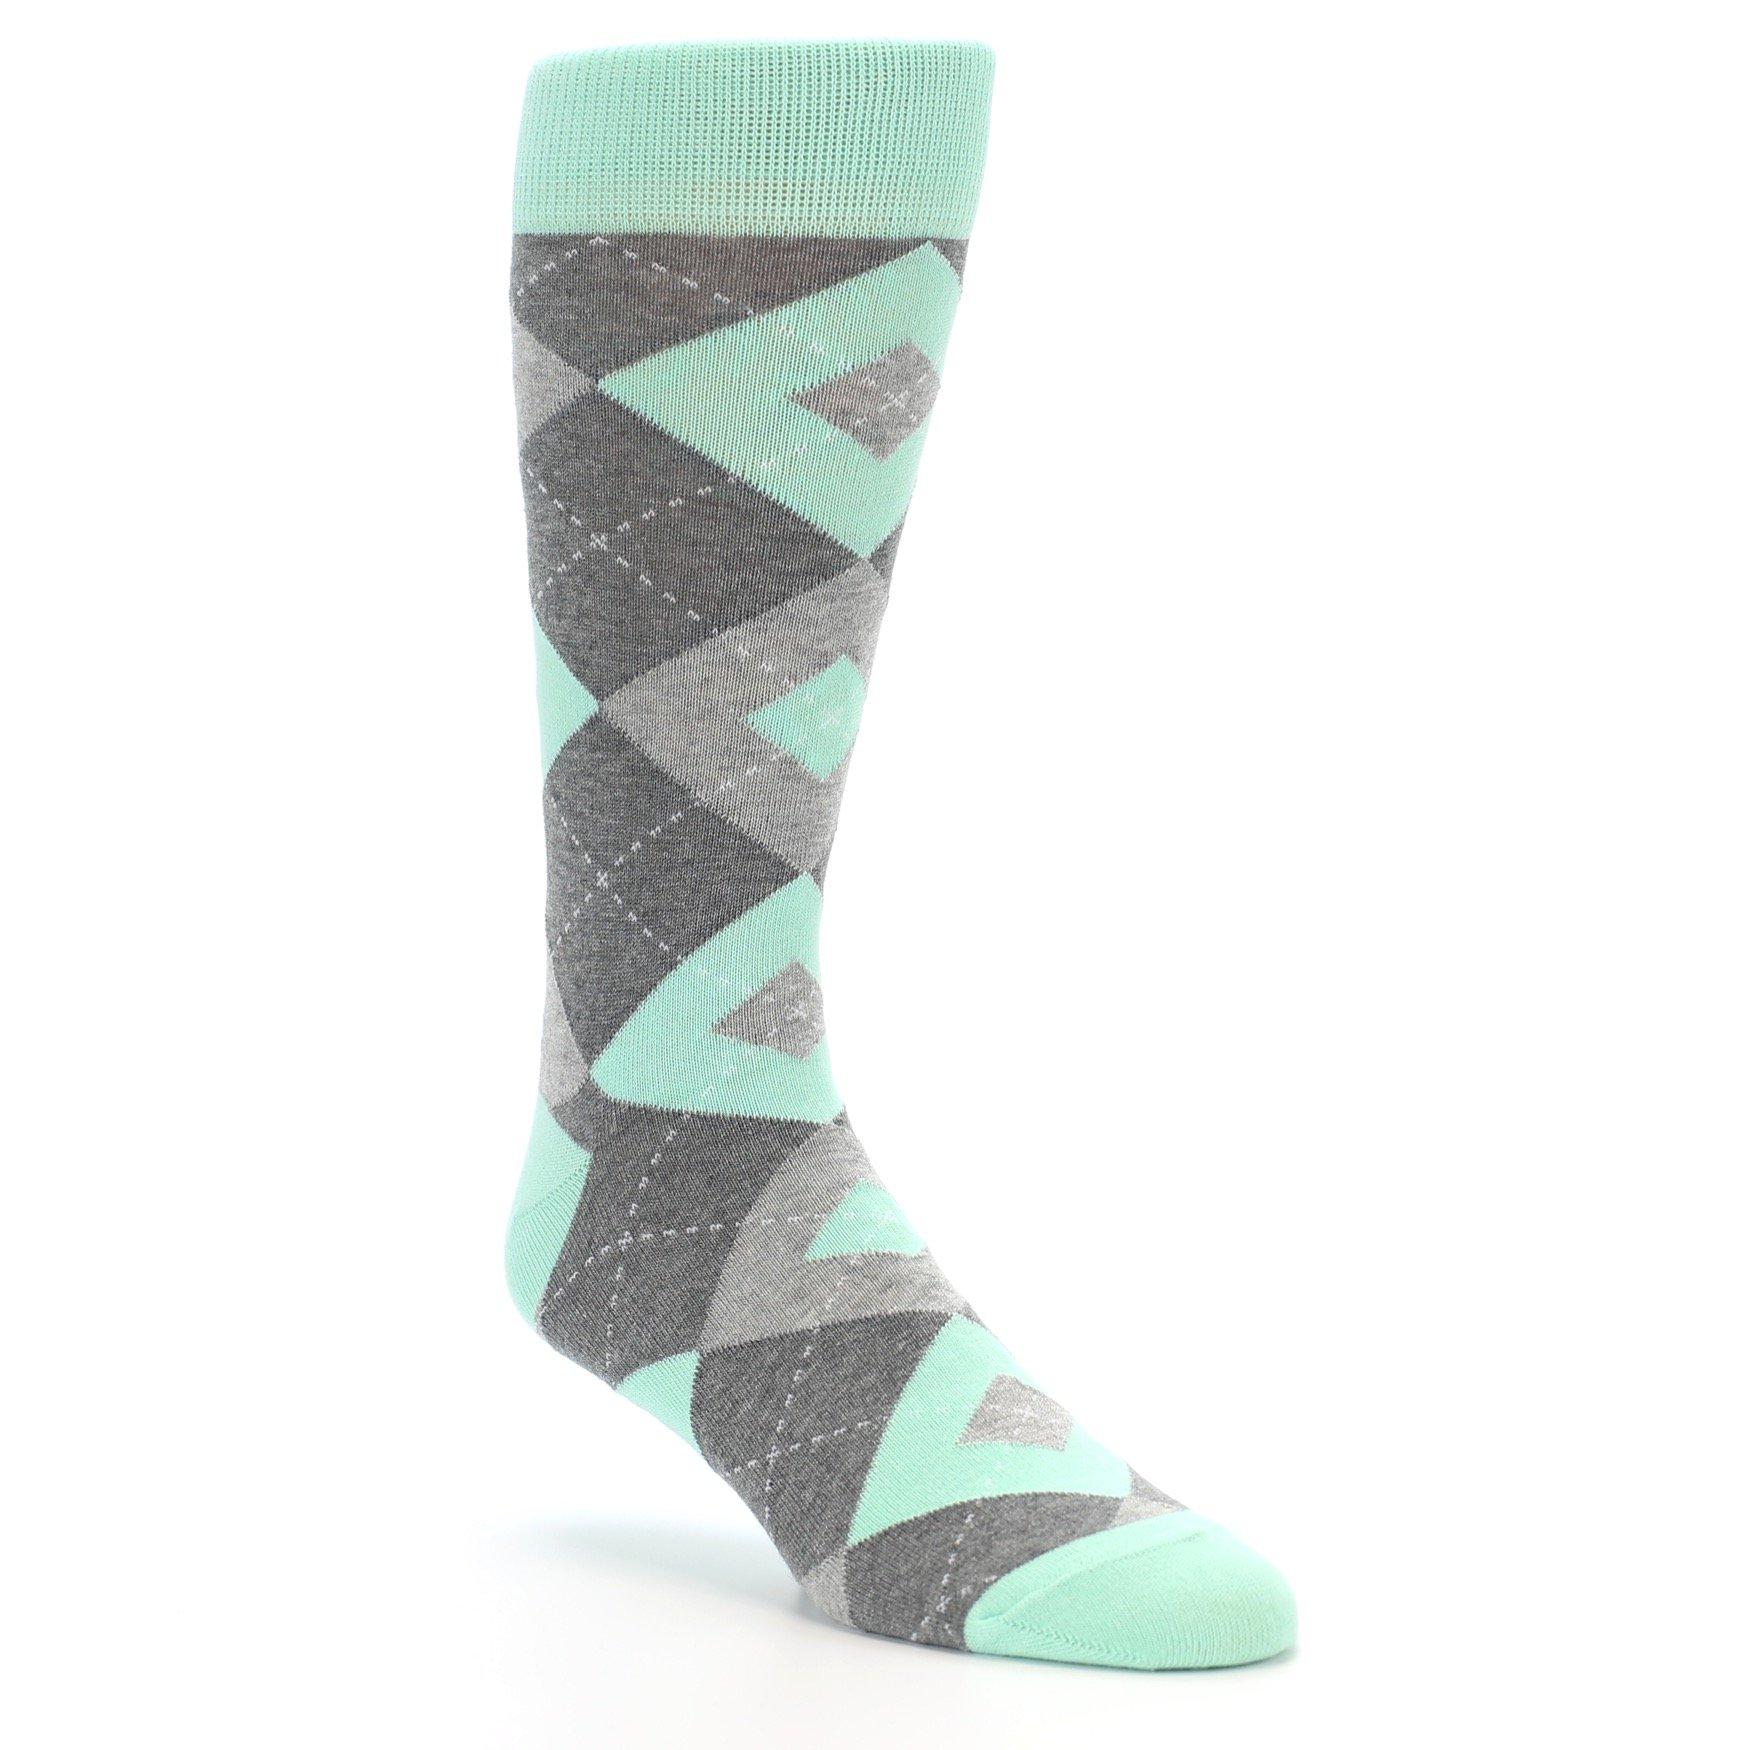 Statement Sockwear Argyle Wedding Groomsmen Men's Socks, Mint Gray Wedding Groomsmen, 8-12